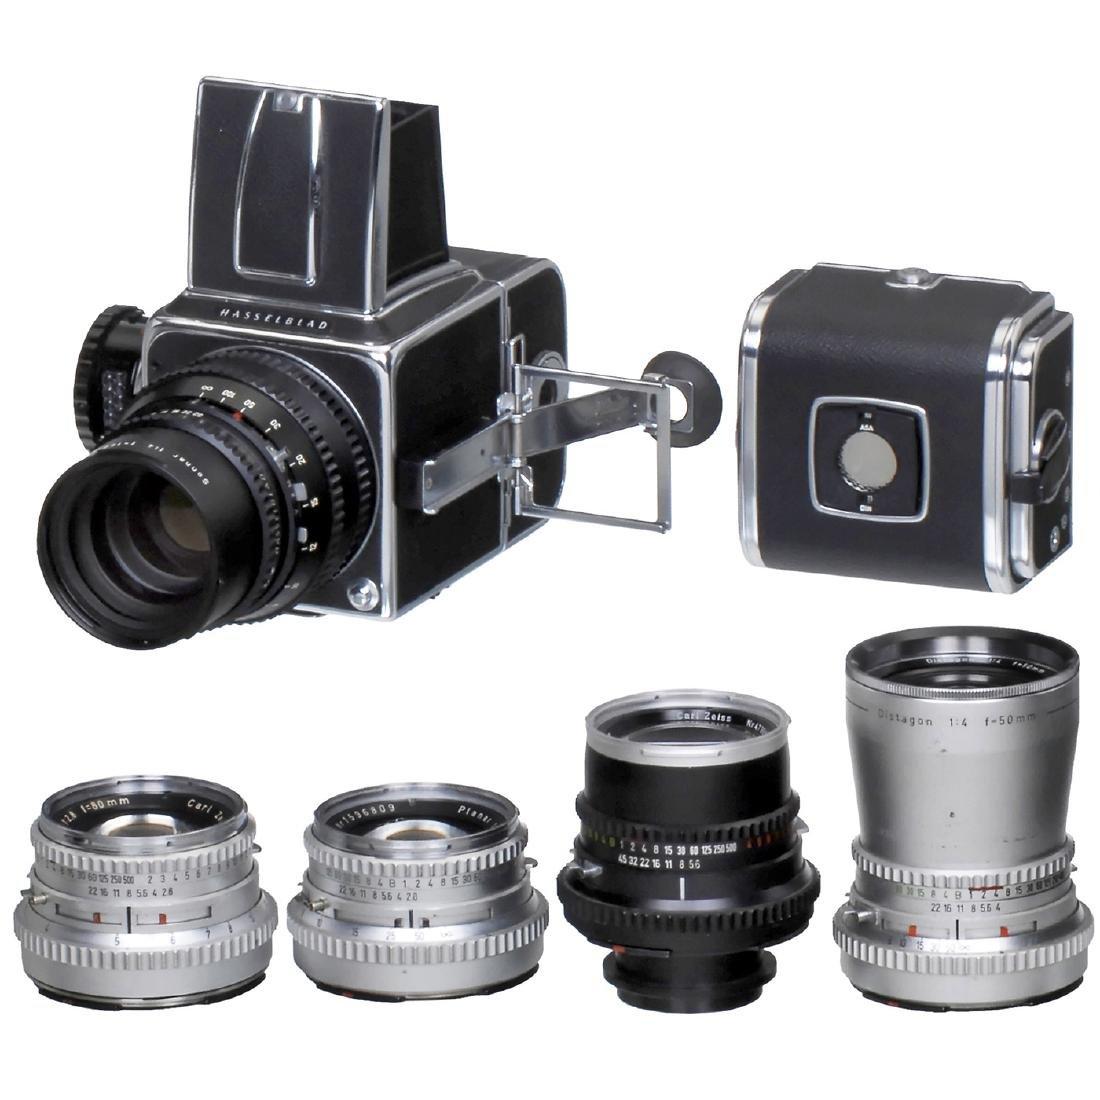 Hasselblad 500C with Lenses